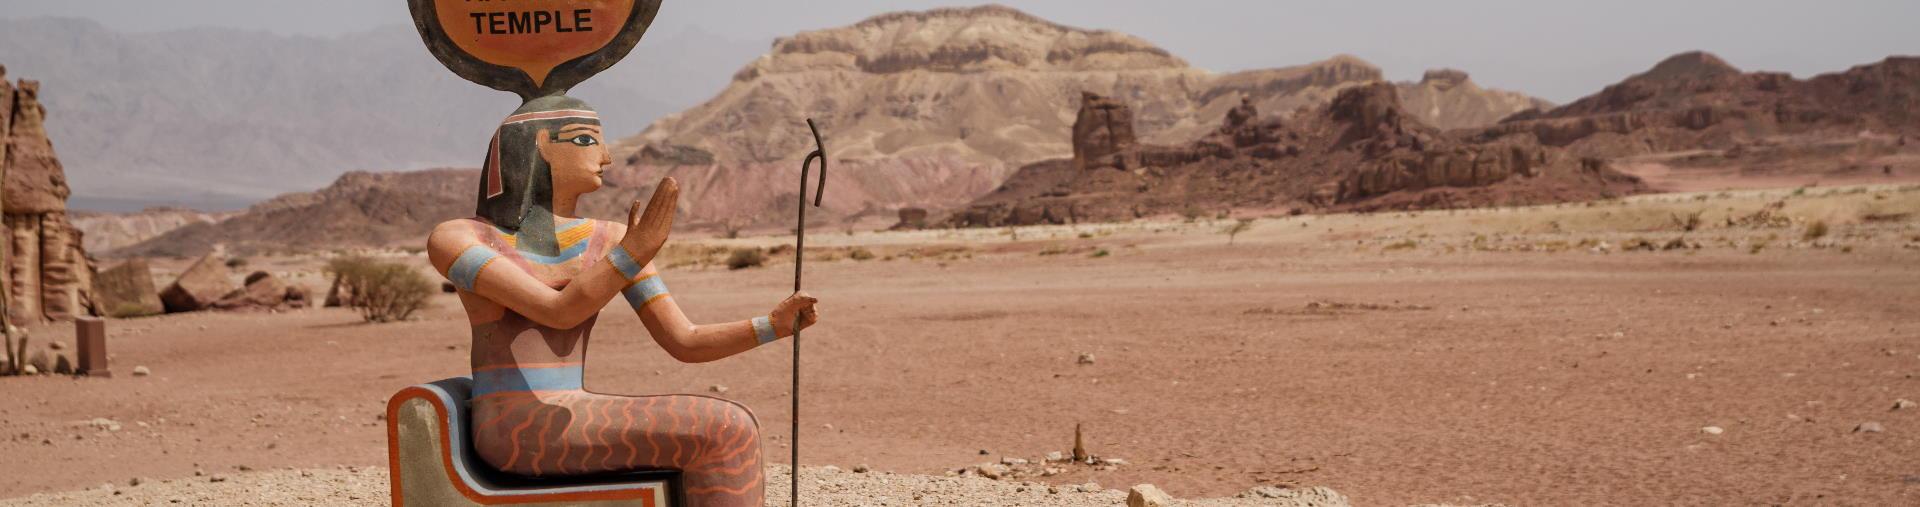 Tour ancient Egyptian remains